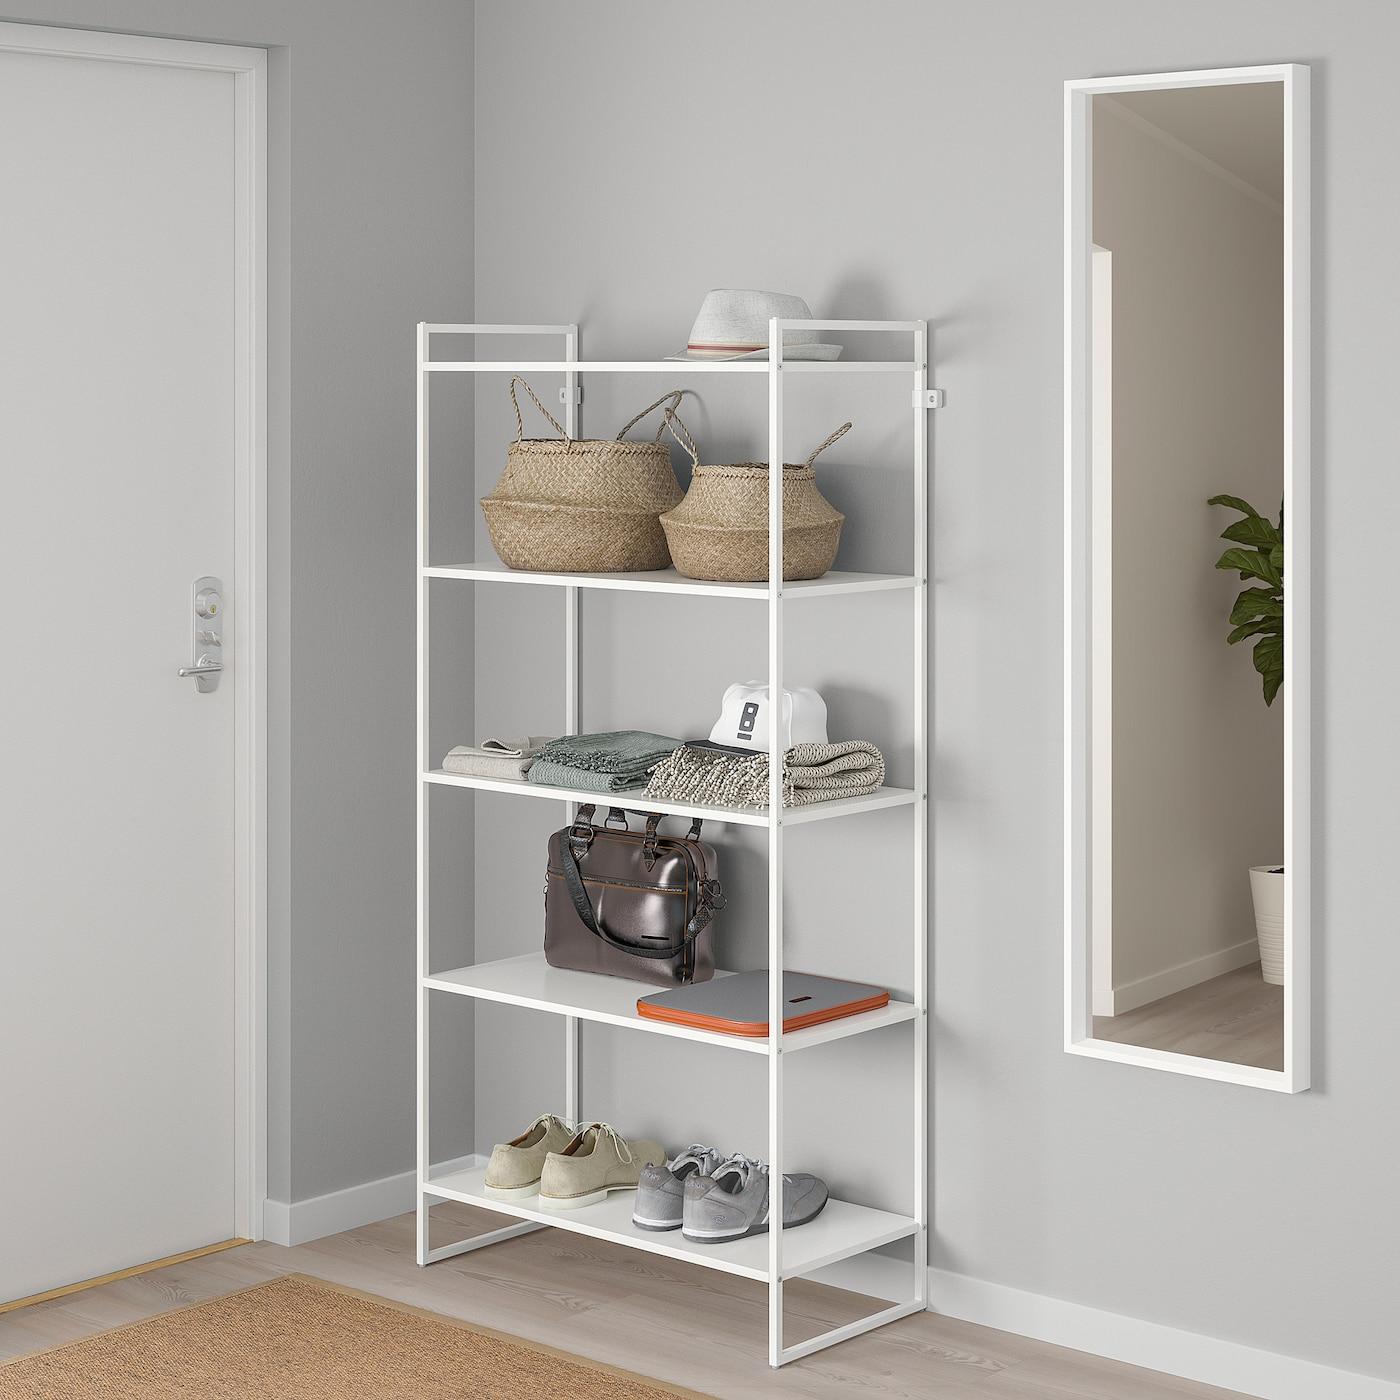 JONAXEL Shelving unit - white 4x4x4 cm